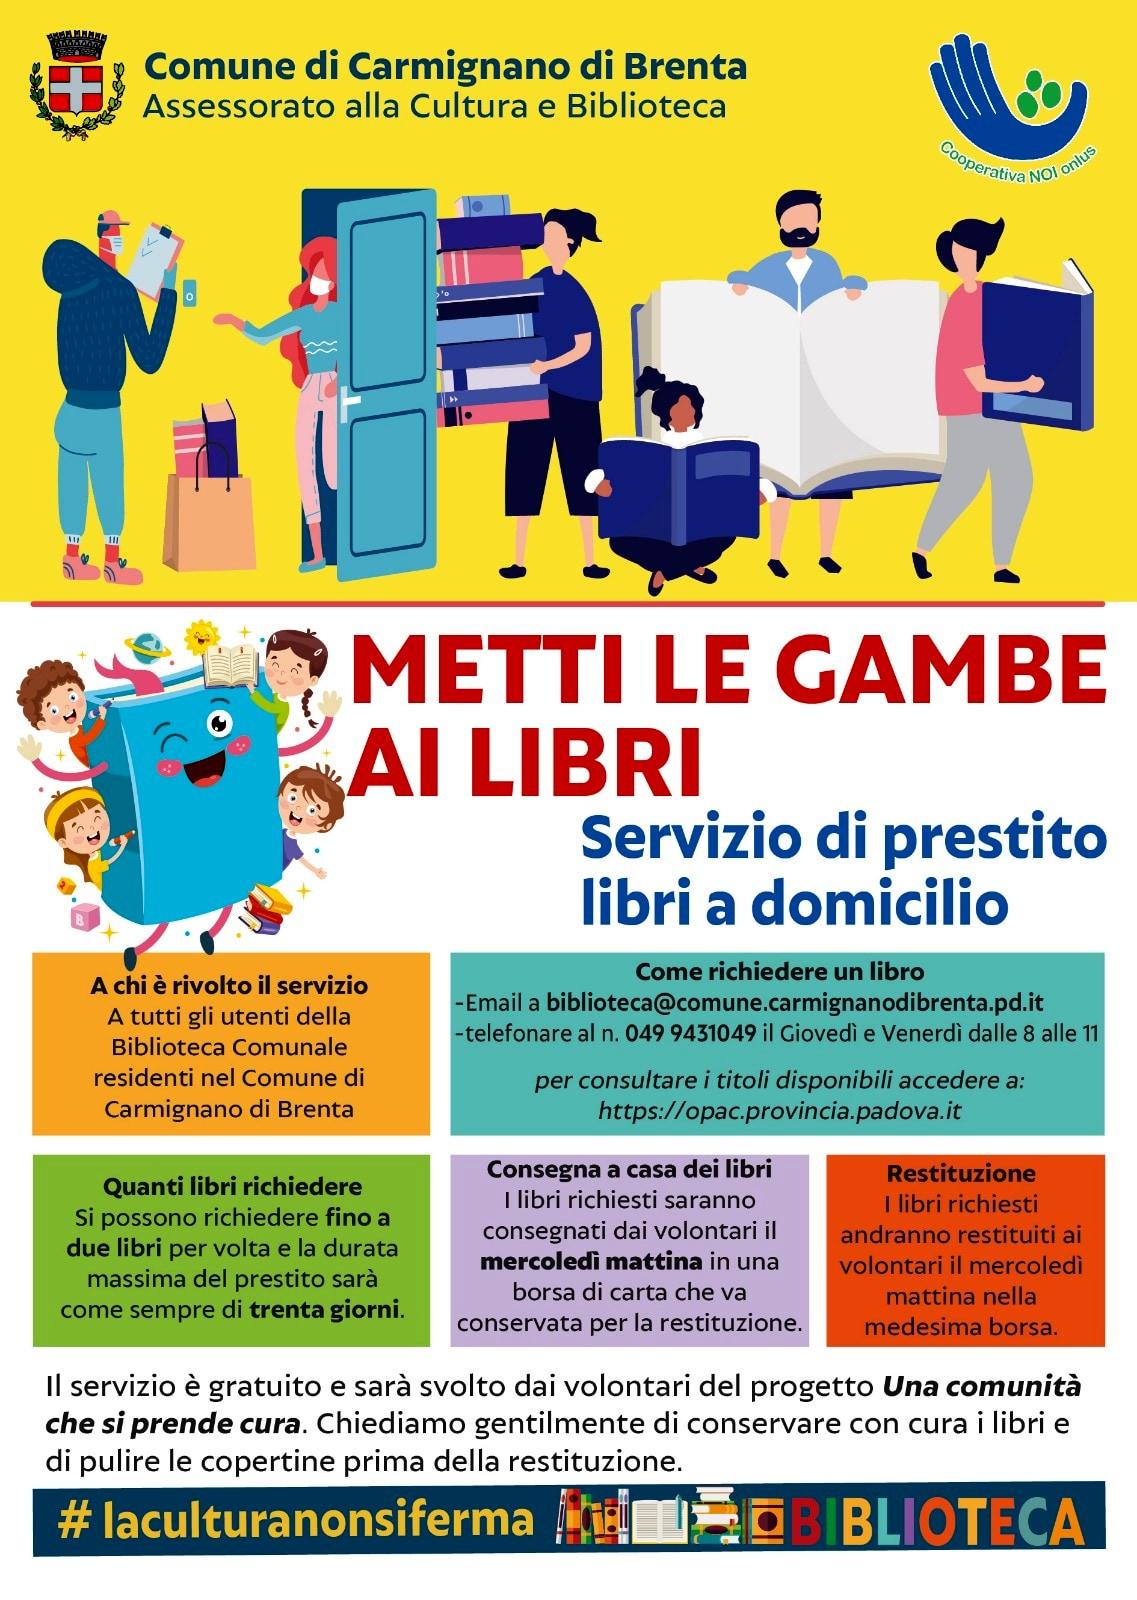 Casa Della Carta Padova a carmignano di brenta #laculturanonsiferma: libri a